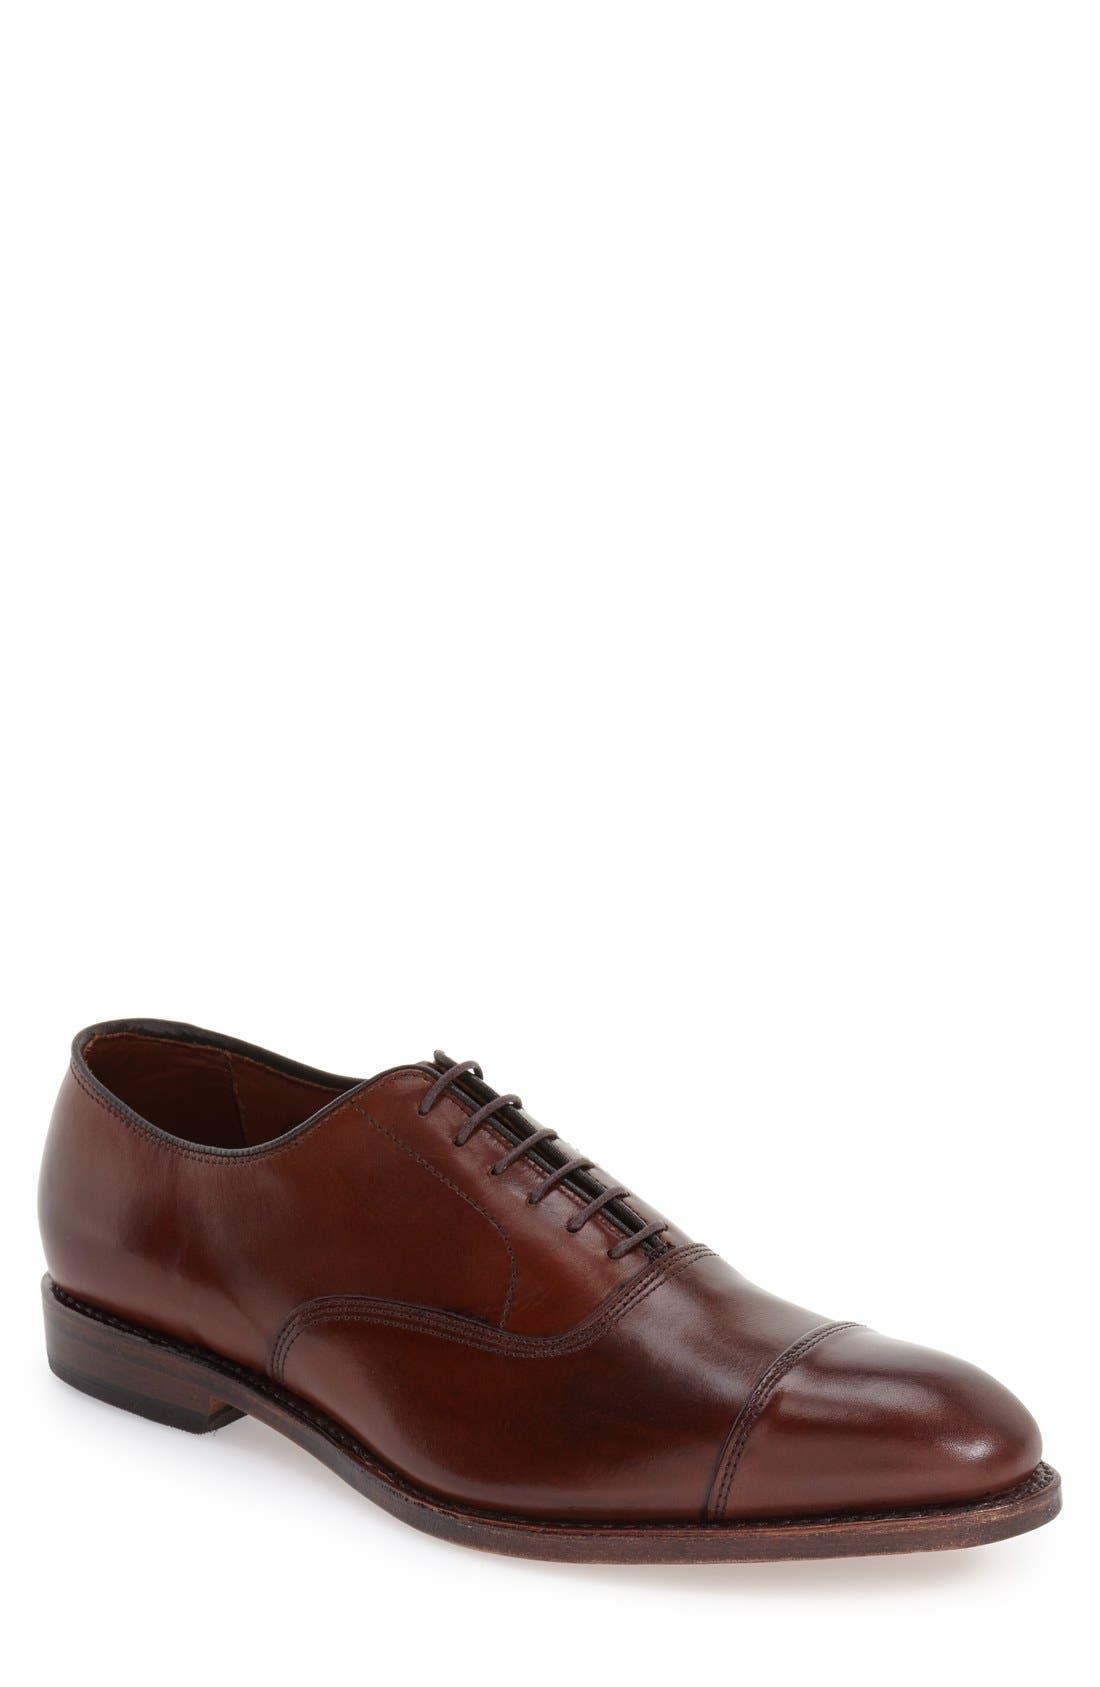 Alternate Image 1 Selected - Allen Edmonds 'Park Avenue' Cap Toe Oxford (Men)